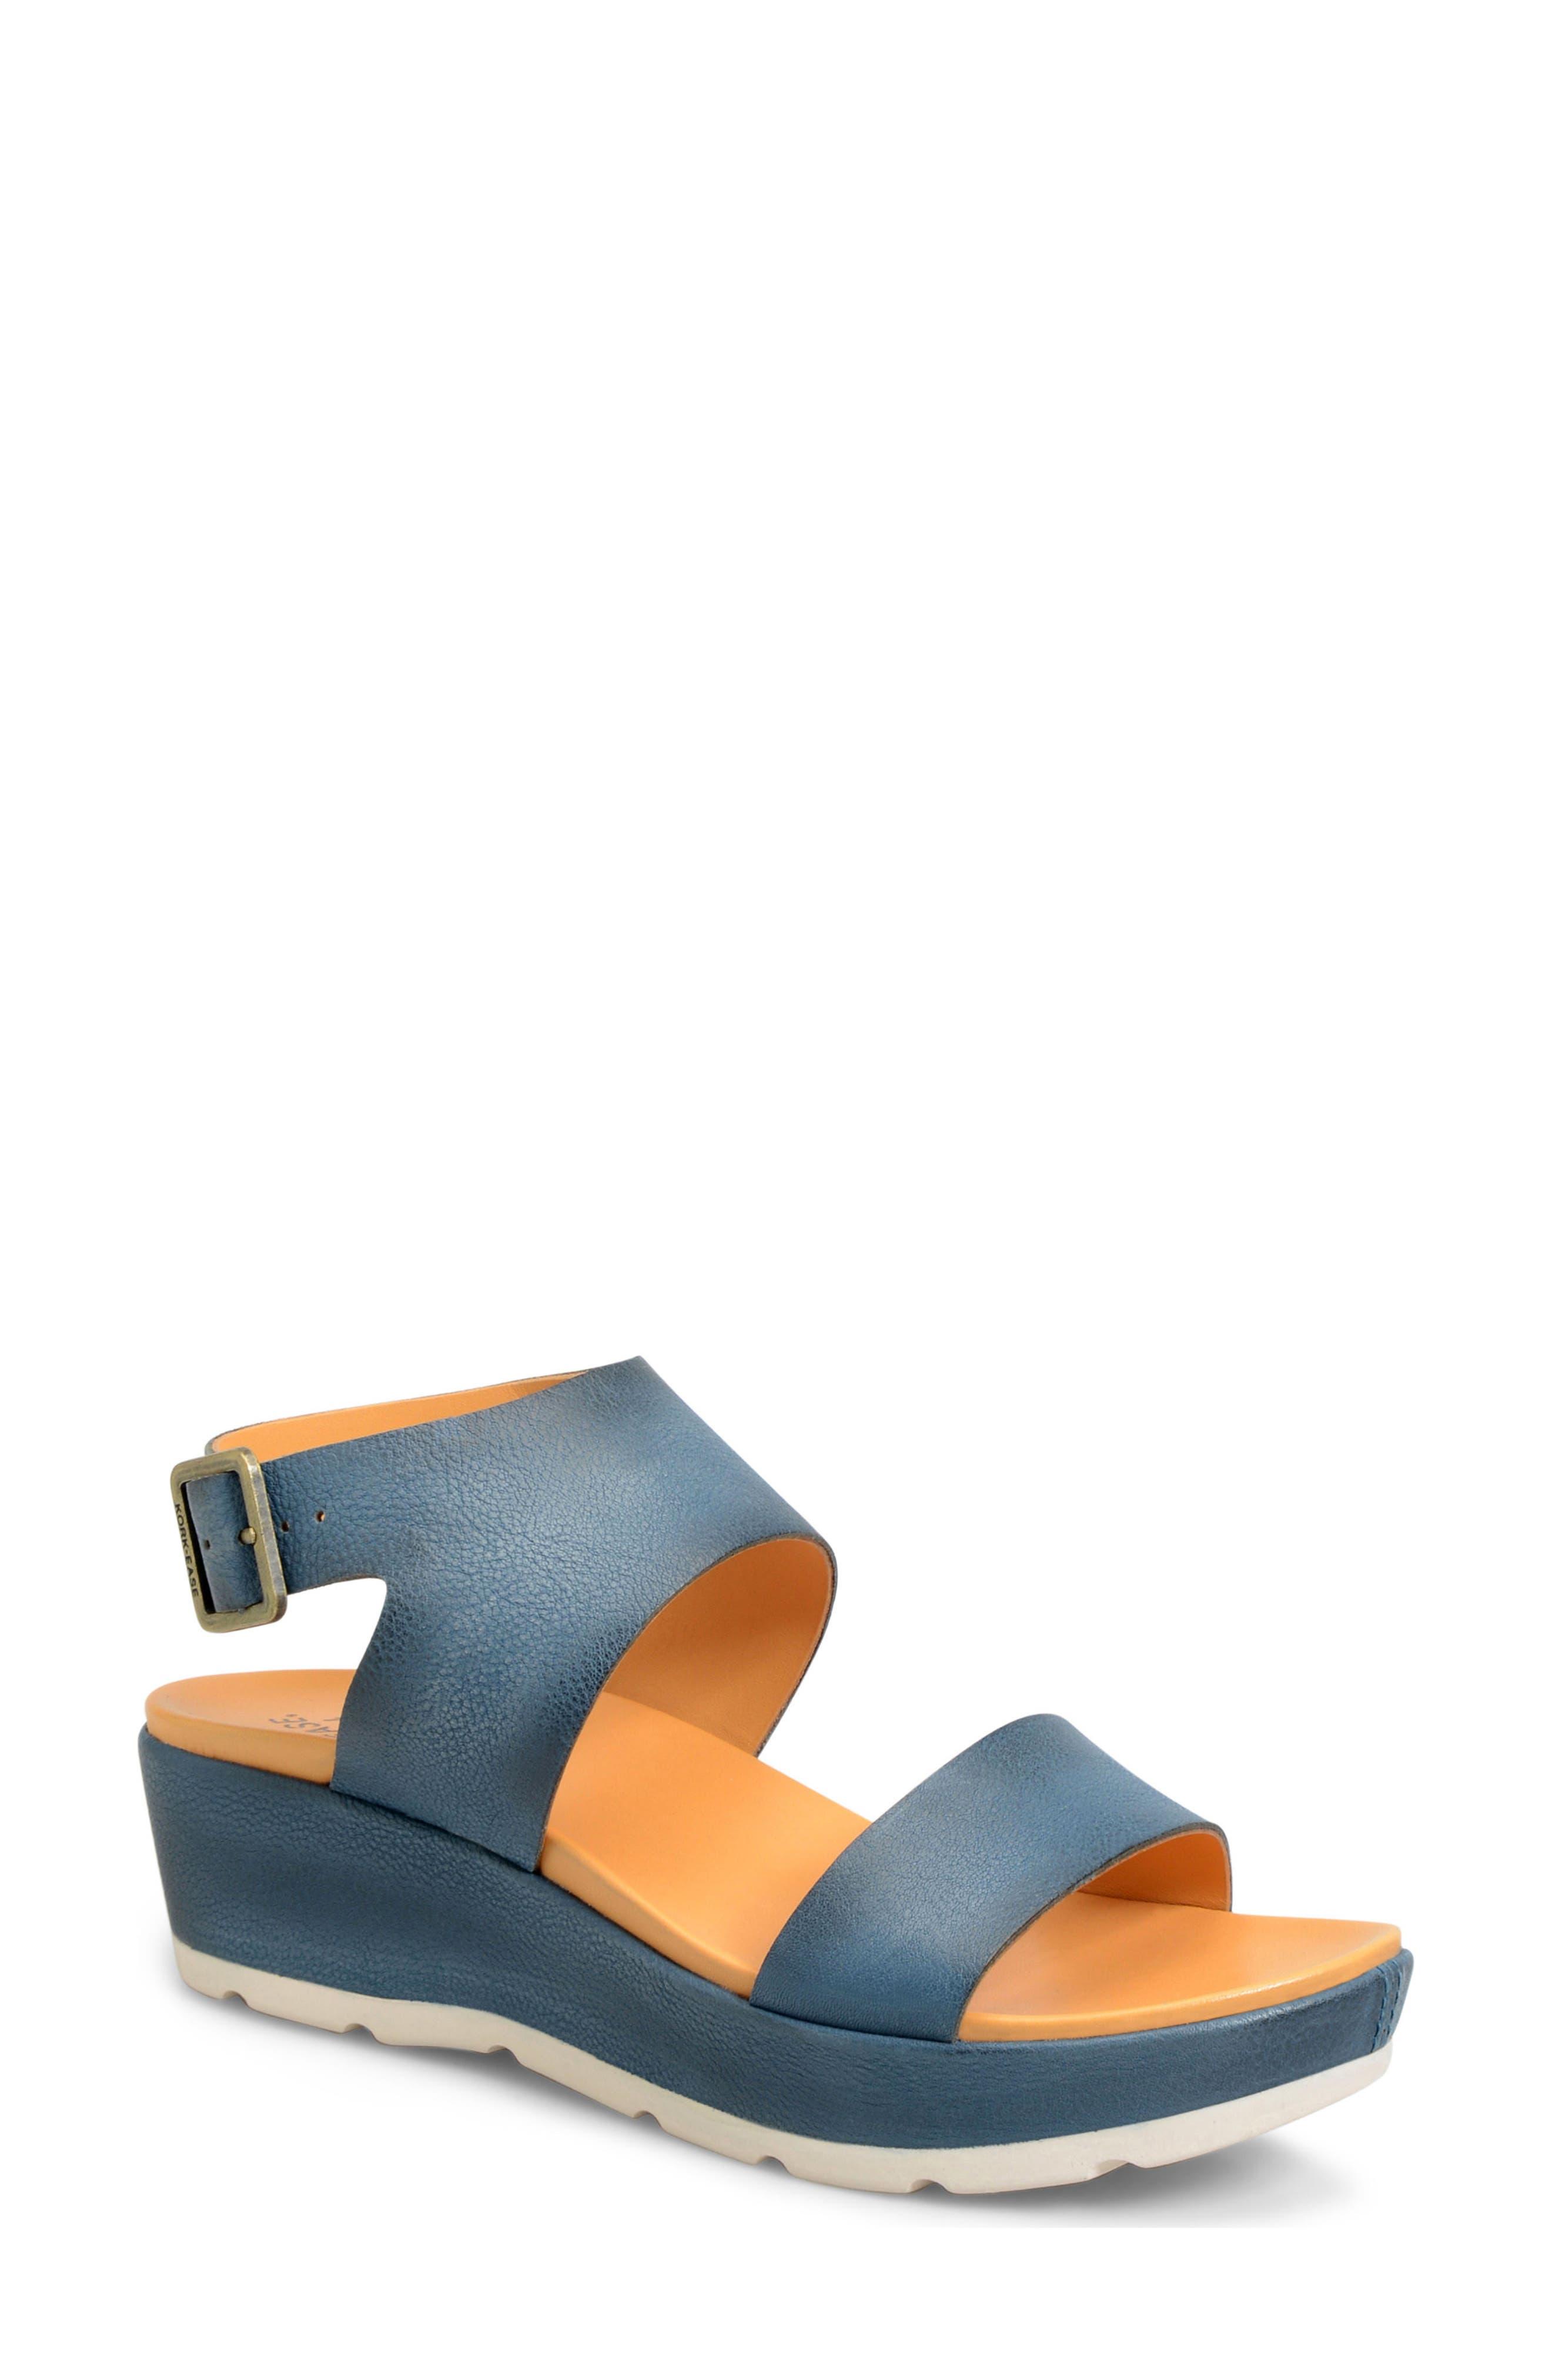 Main Image - Kork-Ease® 'Khloe' Platform Wedge Sandal (Women)